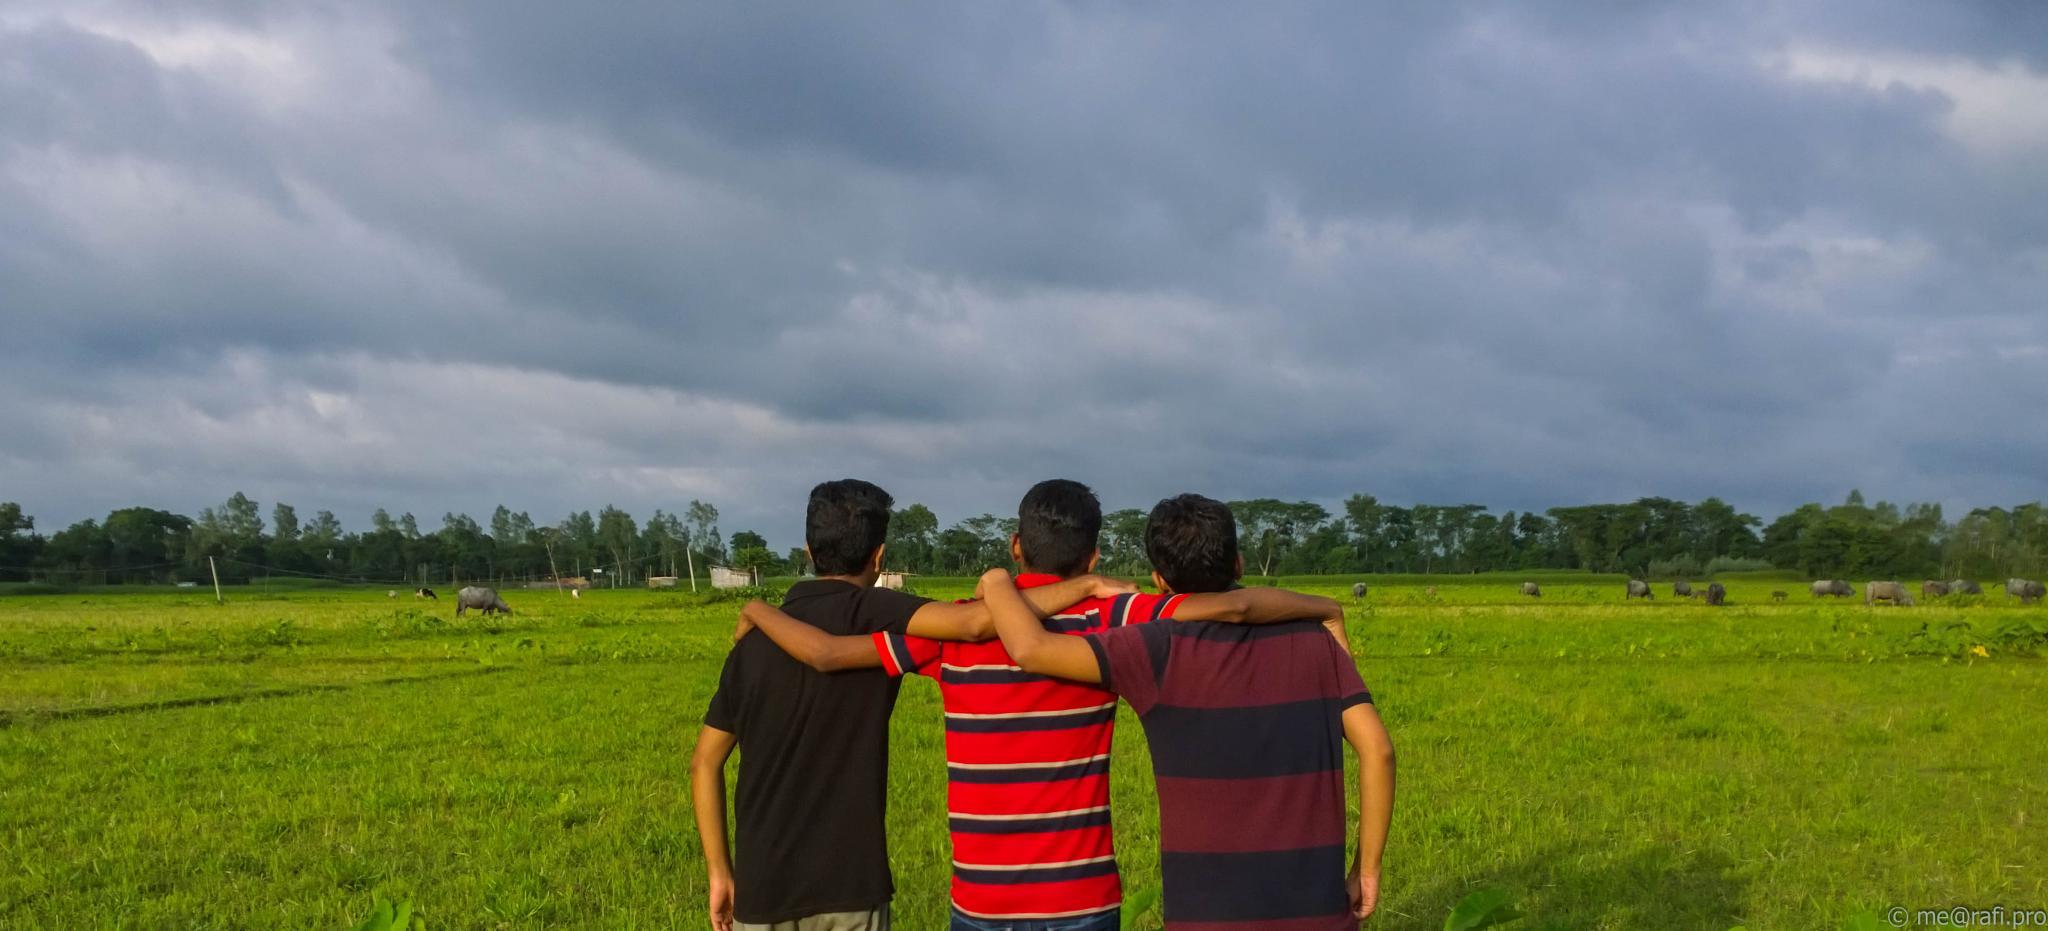 Cloudy Sky by Faozul Azim Rafi